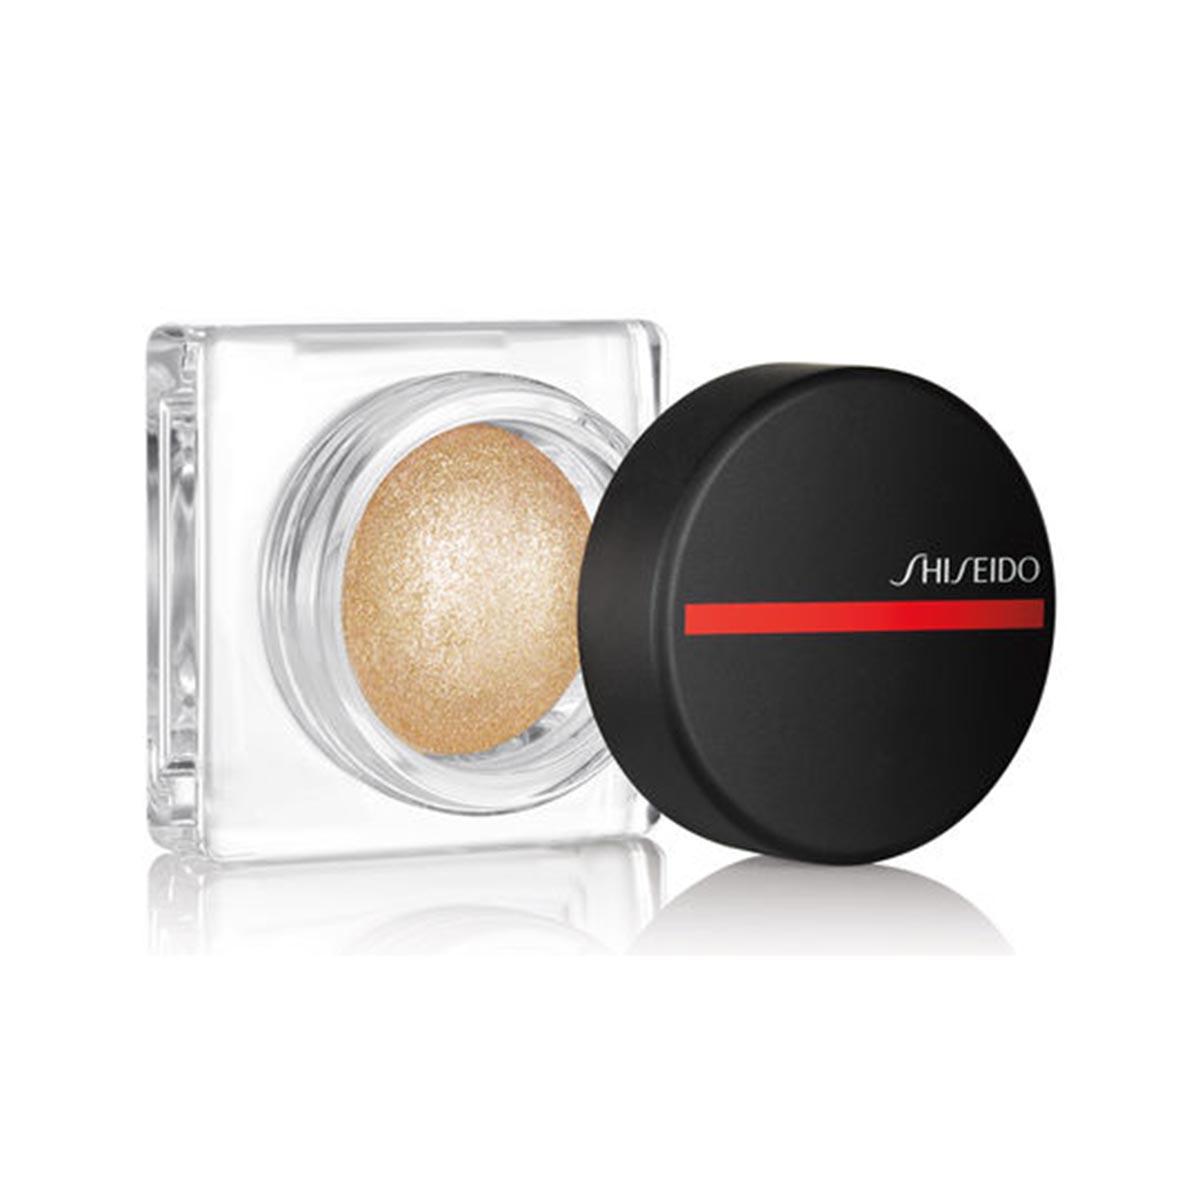 Shiseido aura dew 02